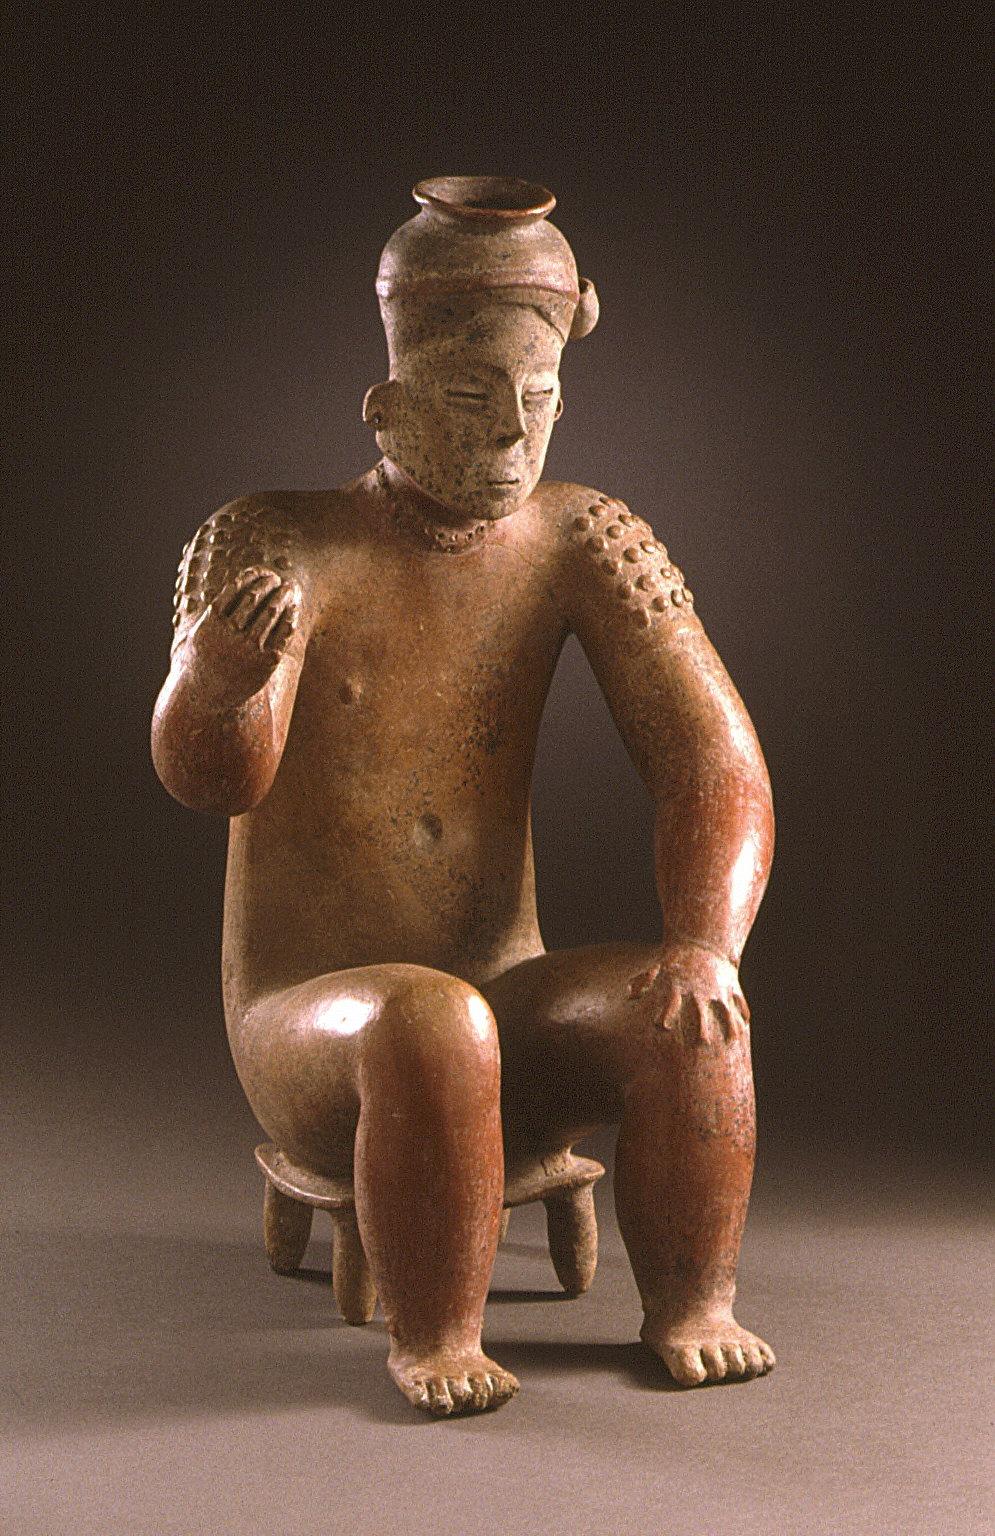 Seated Male Figure